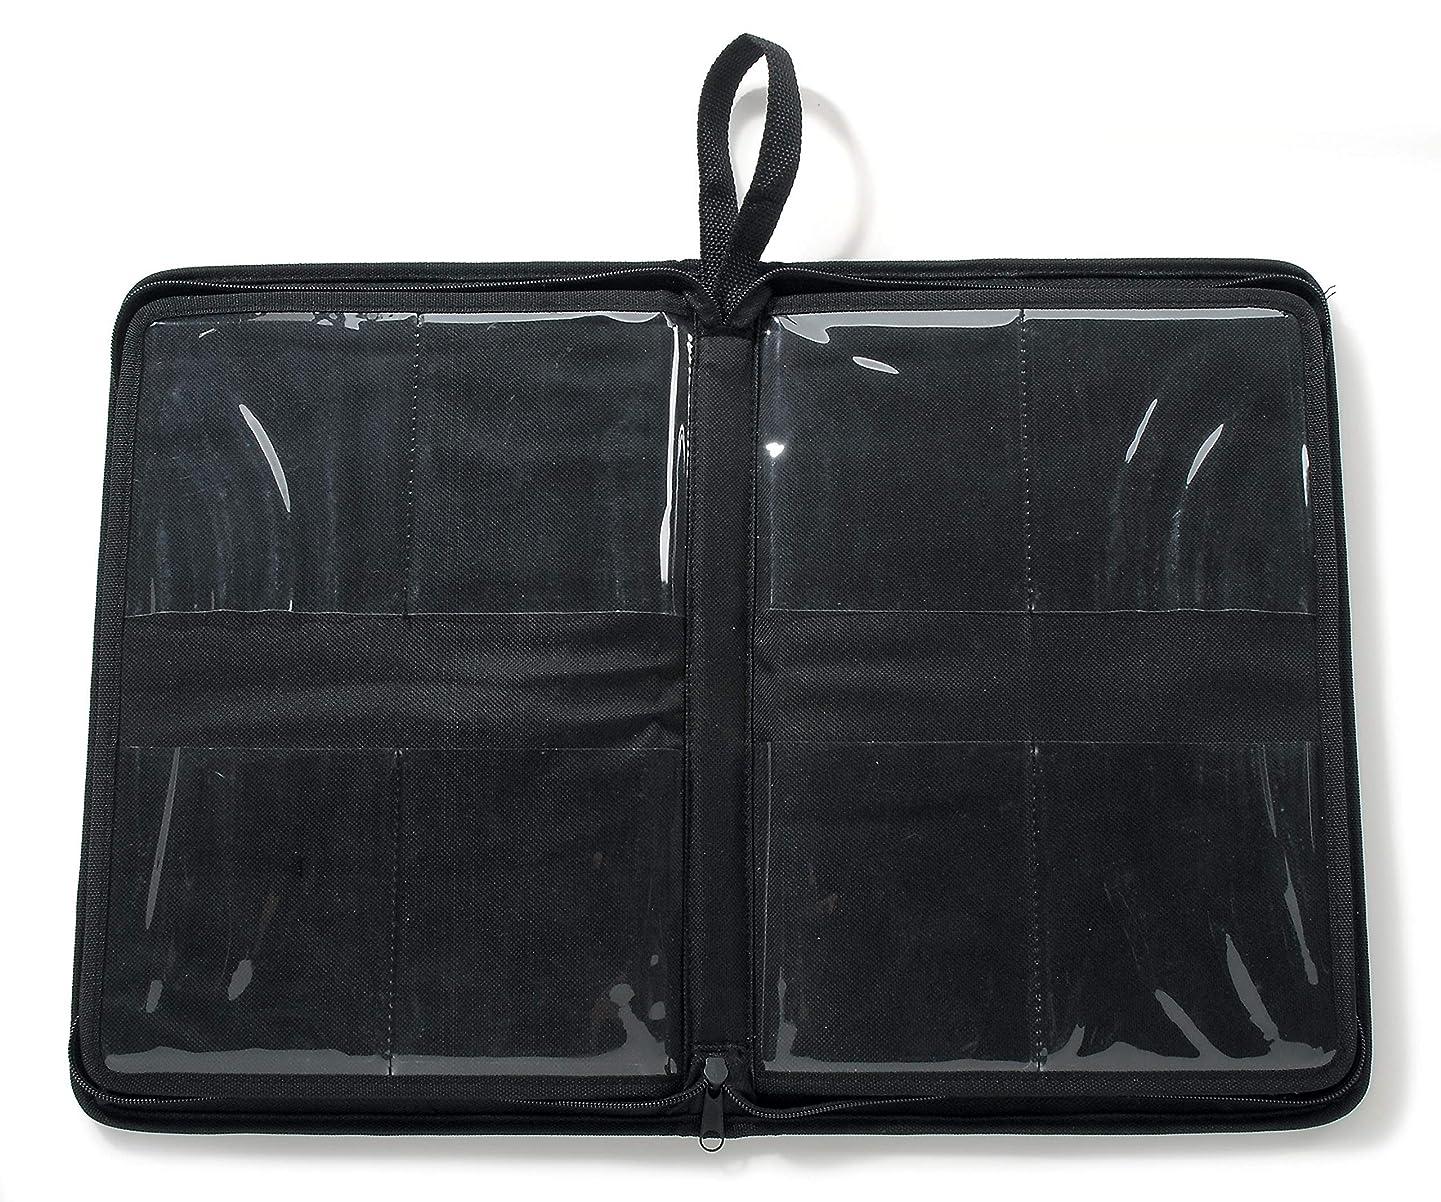 Darice Embossing Folder Storage Case for 4.25 x 5.75 inch Folders, Holds 40